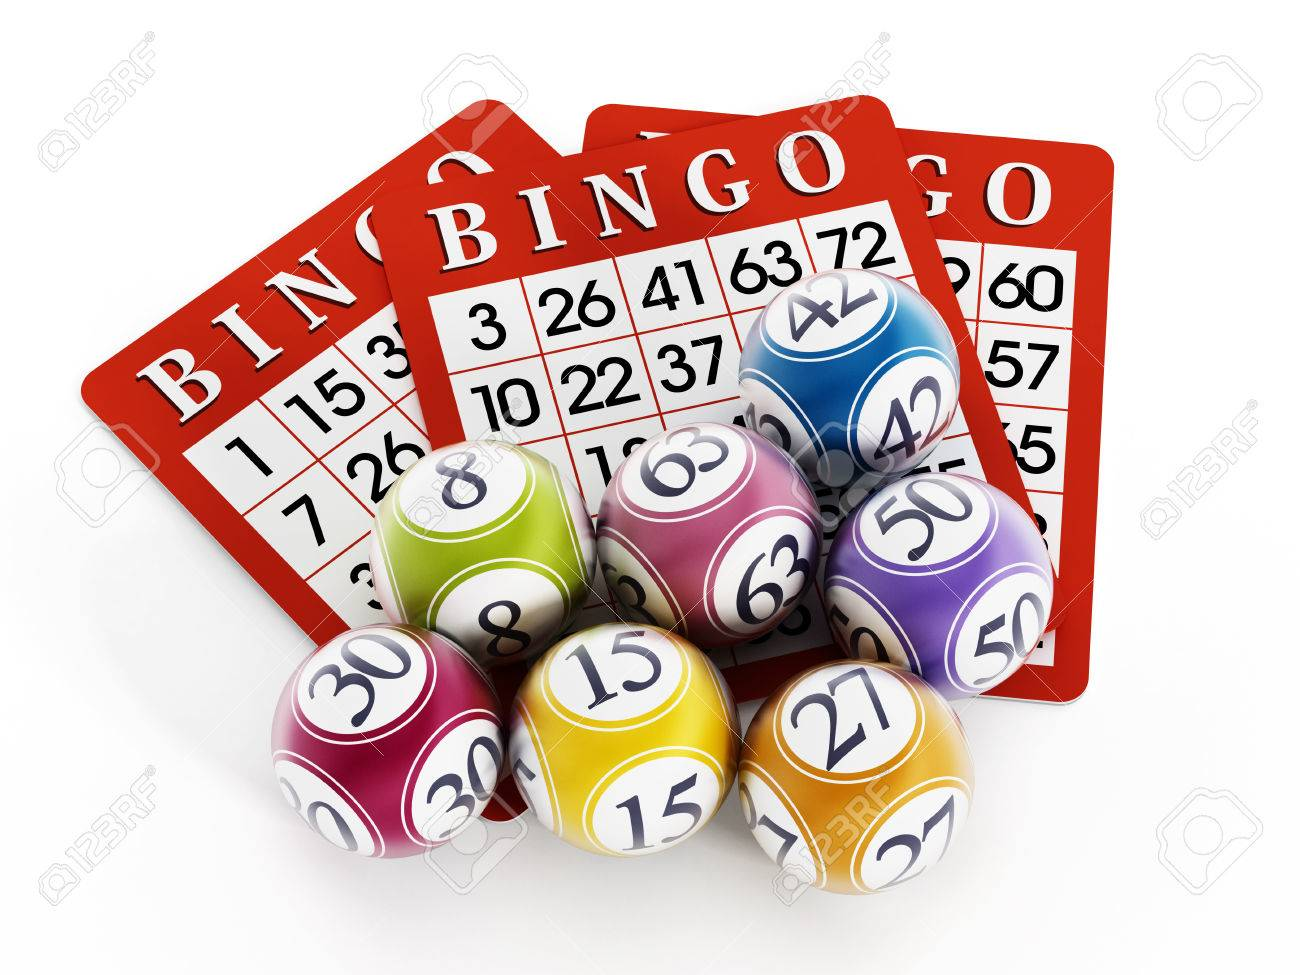 Bingo balls and cards isolated on white background. Stock Photo - 35148845